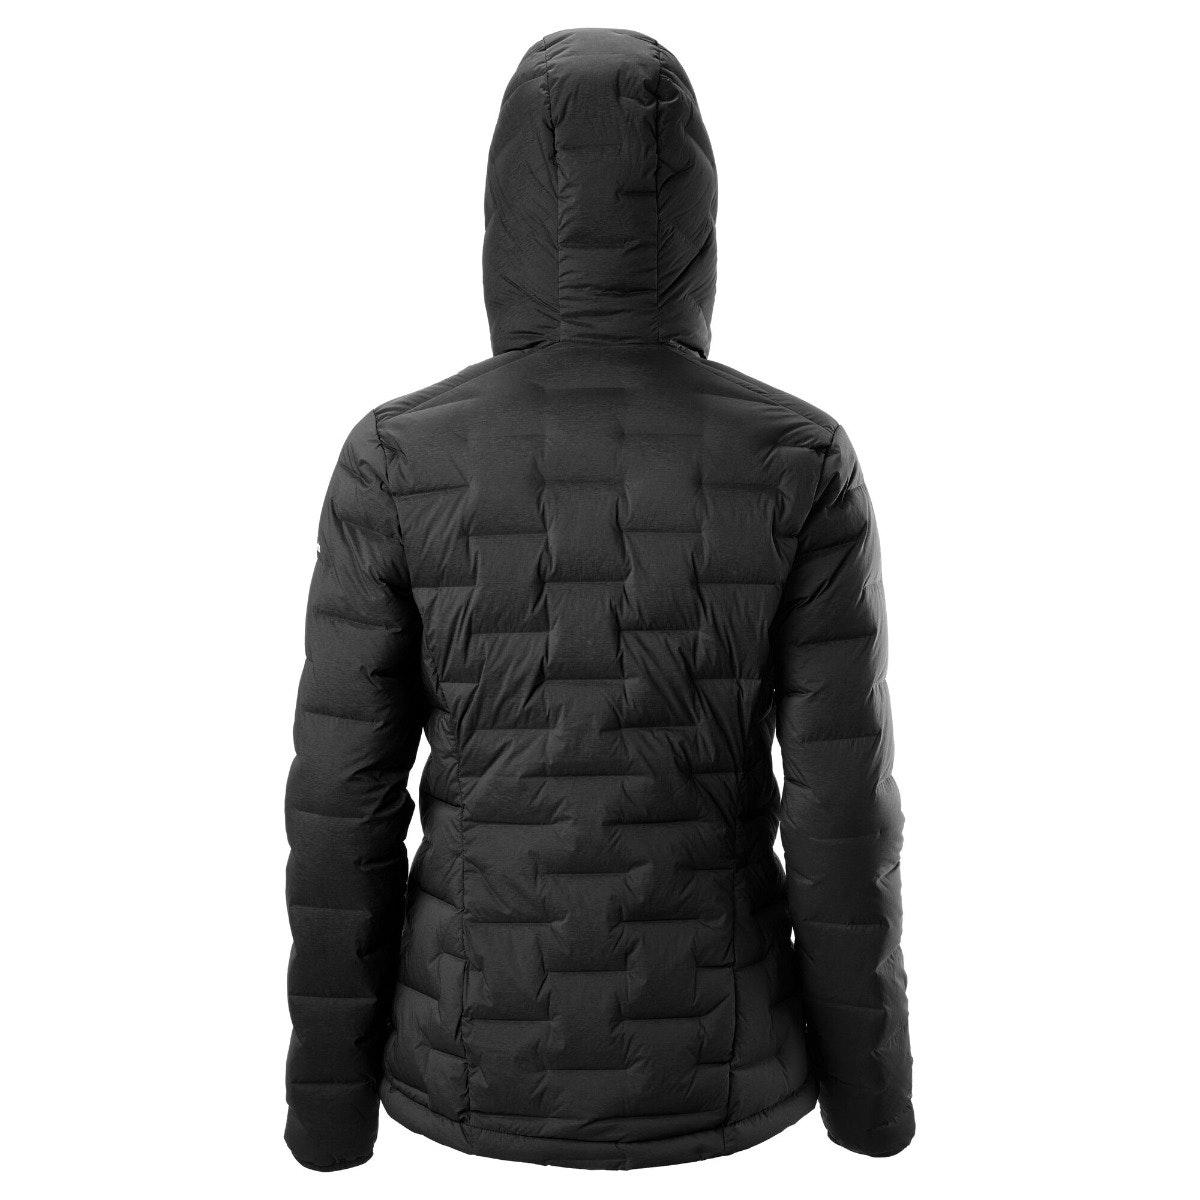 NEW-Kathmandu-Federate-Women-039-s-Stretch-Down-Hooded-Jacket thumbnail 5